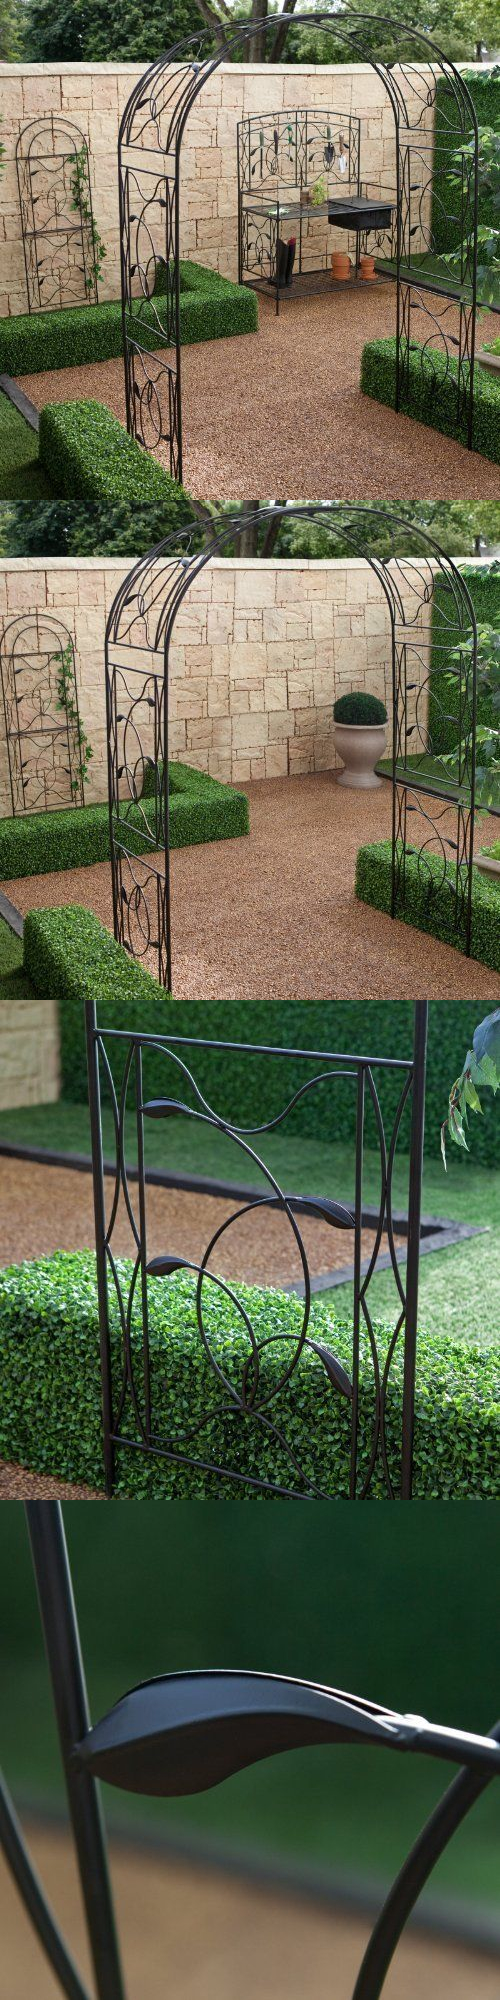 Arbors and Arches 180993: Patio Garden Decor Backyard Weddings Yard ...